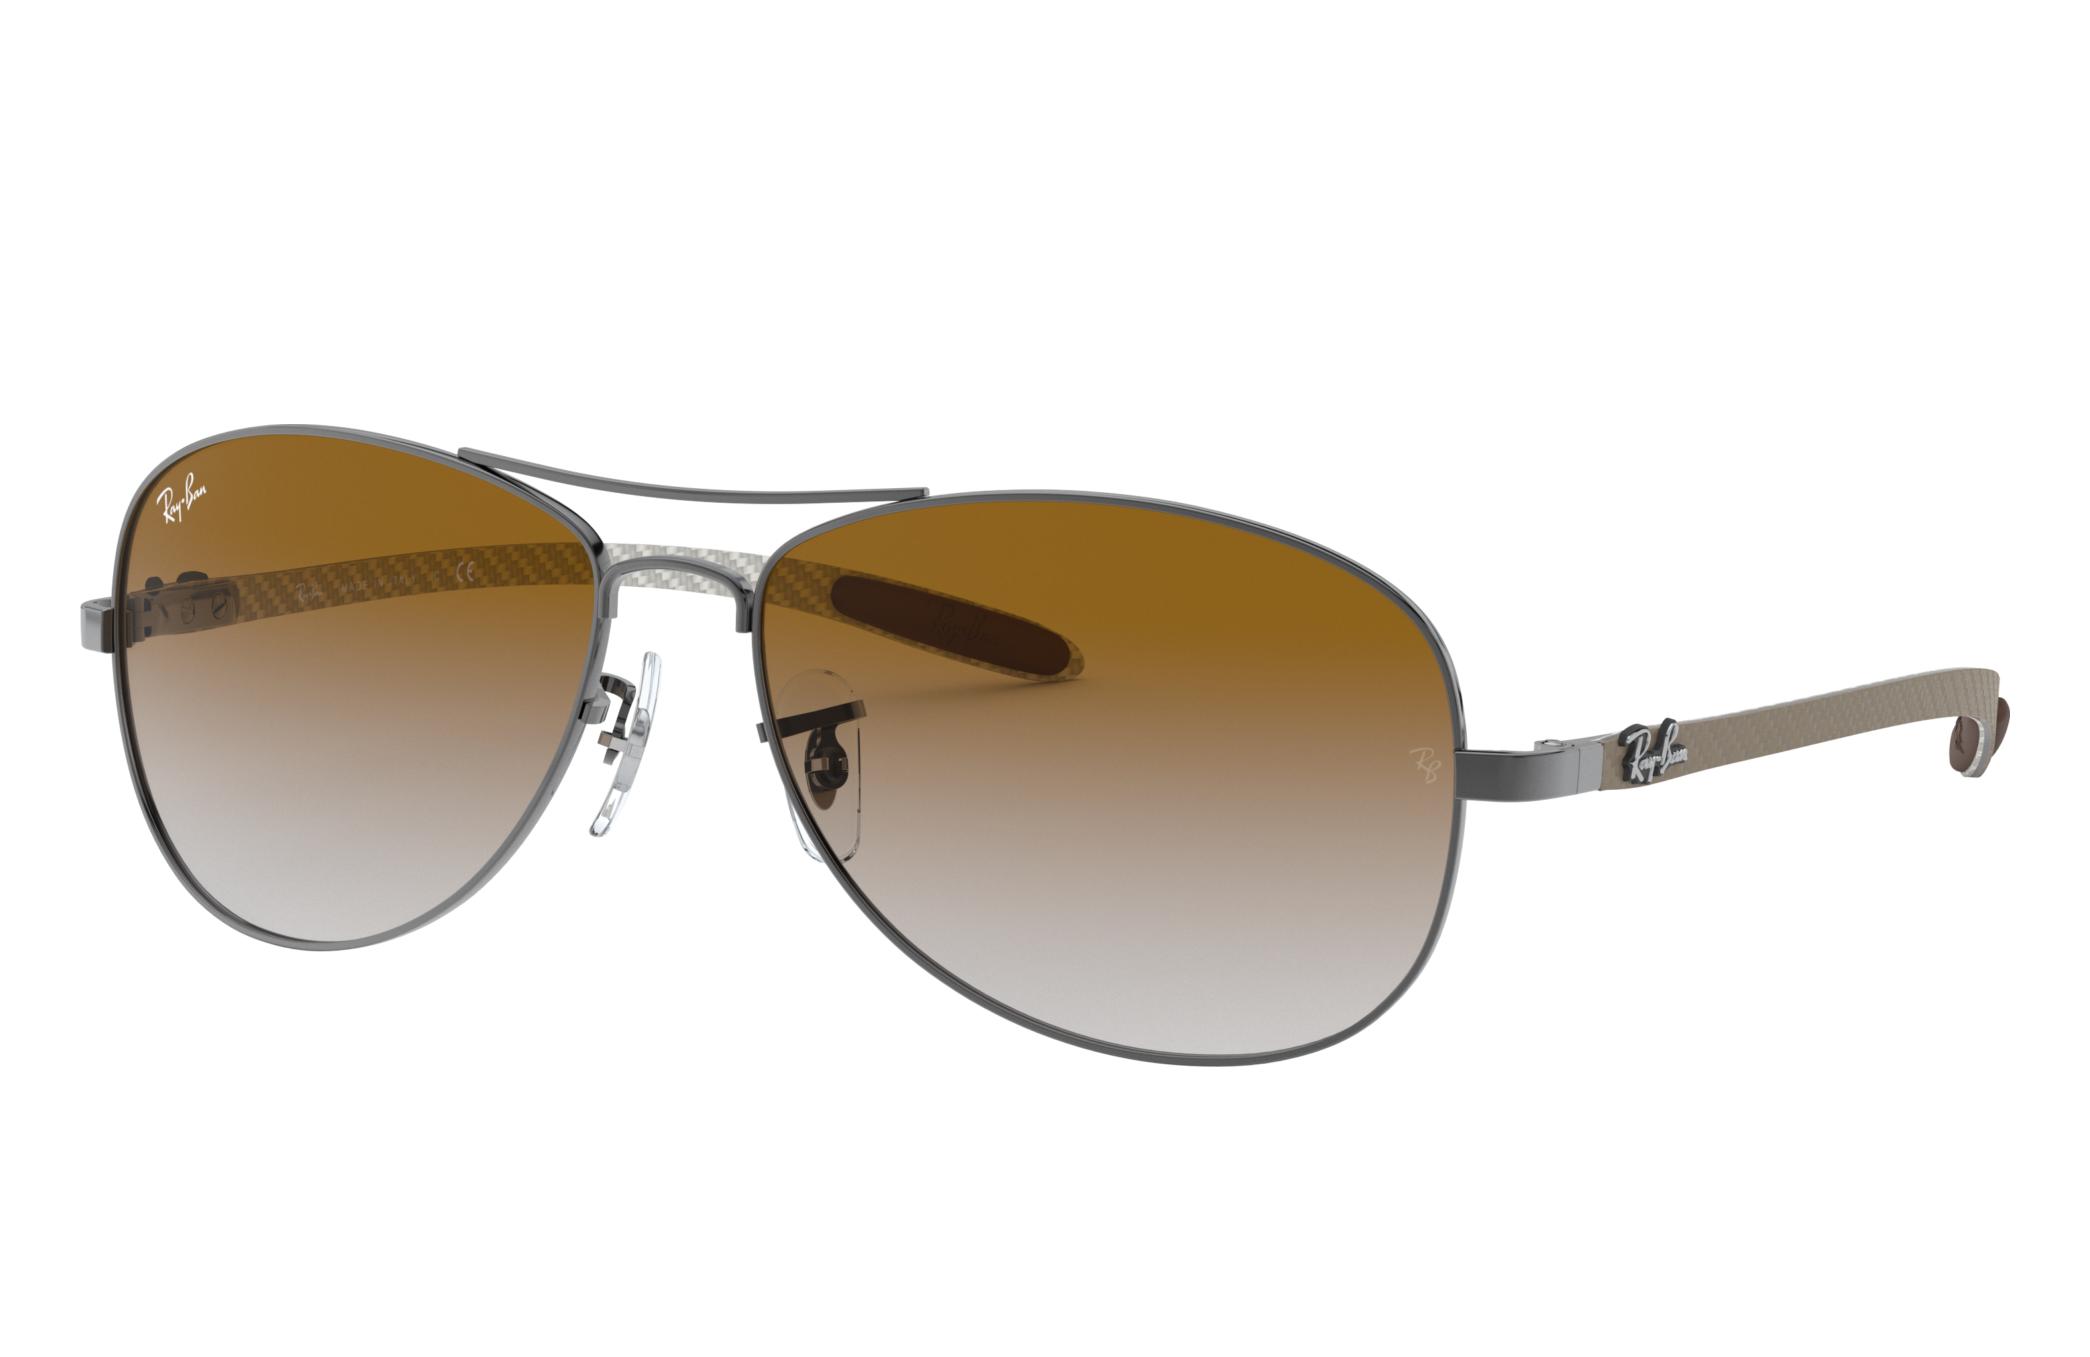 Ray-Ban Rb8301 Grey, Brown Lenses - RB8301